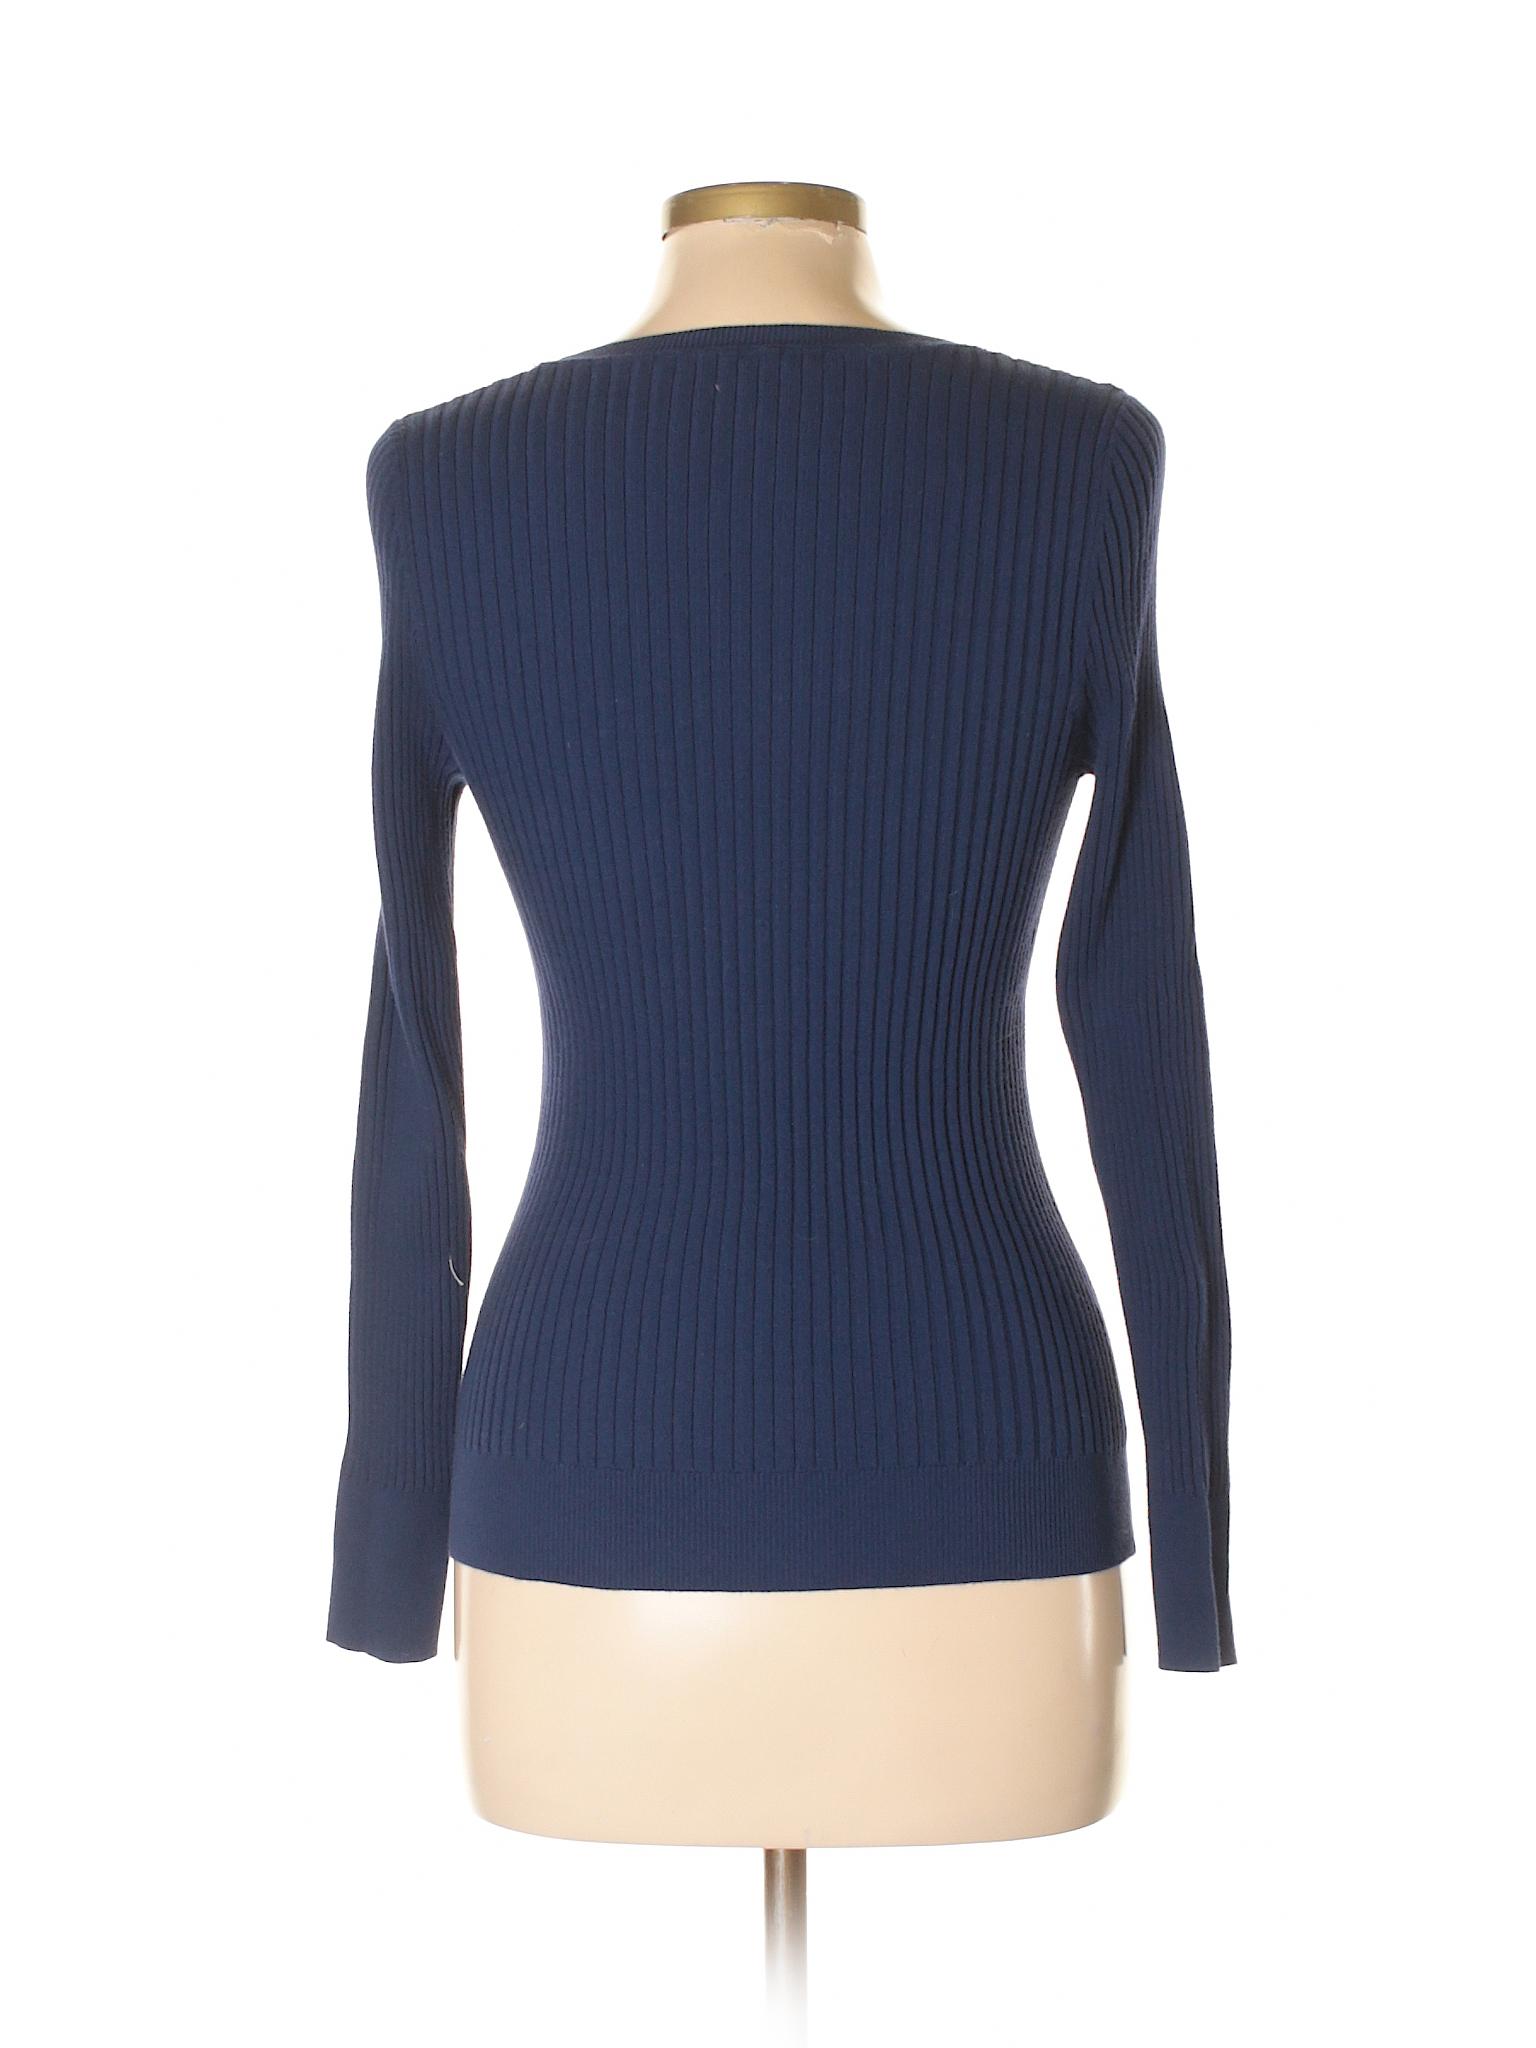 Victoria's Boutique Victoria's Pullover Victoria's Secret Sweater Sweater Pullover Boutique Boutique Secret Secret A1q6px4aw